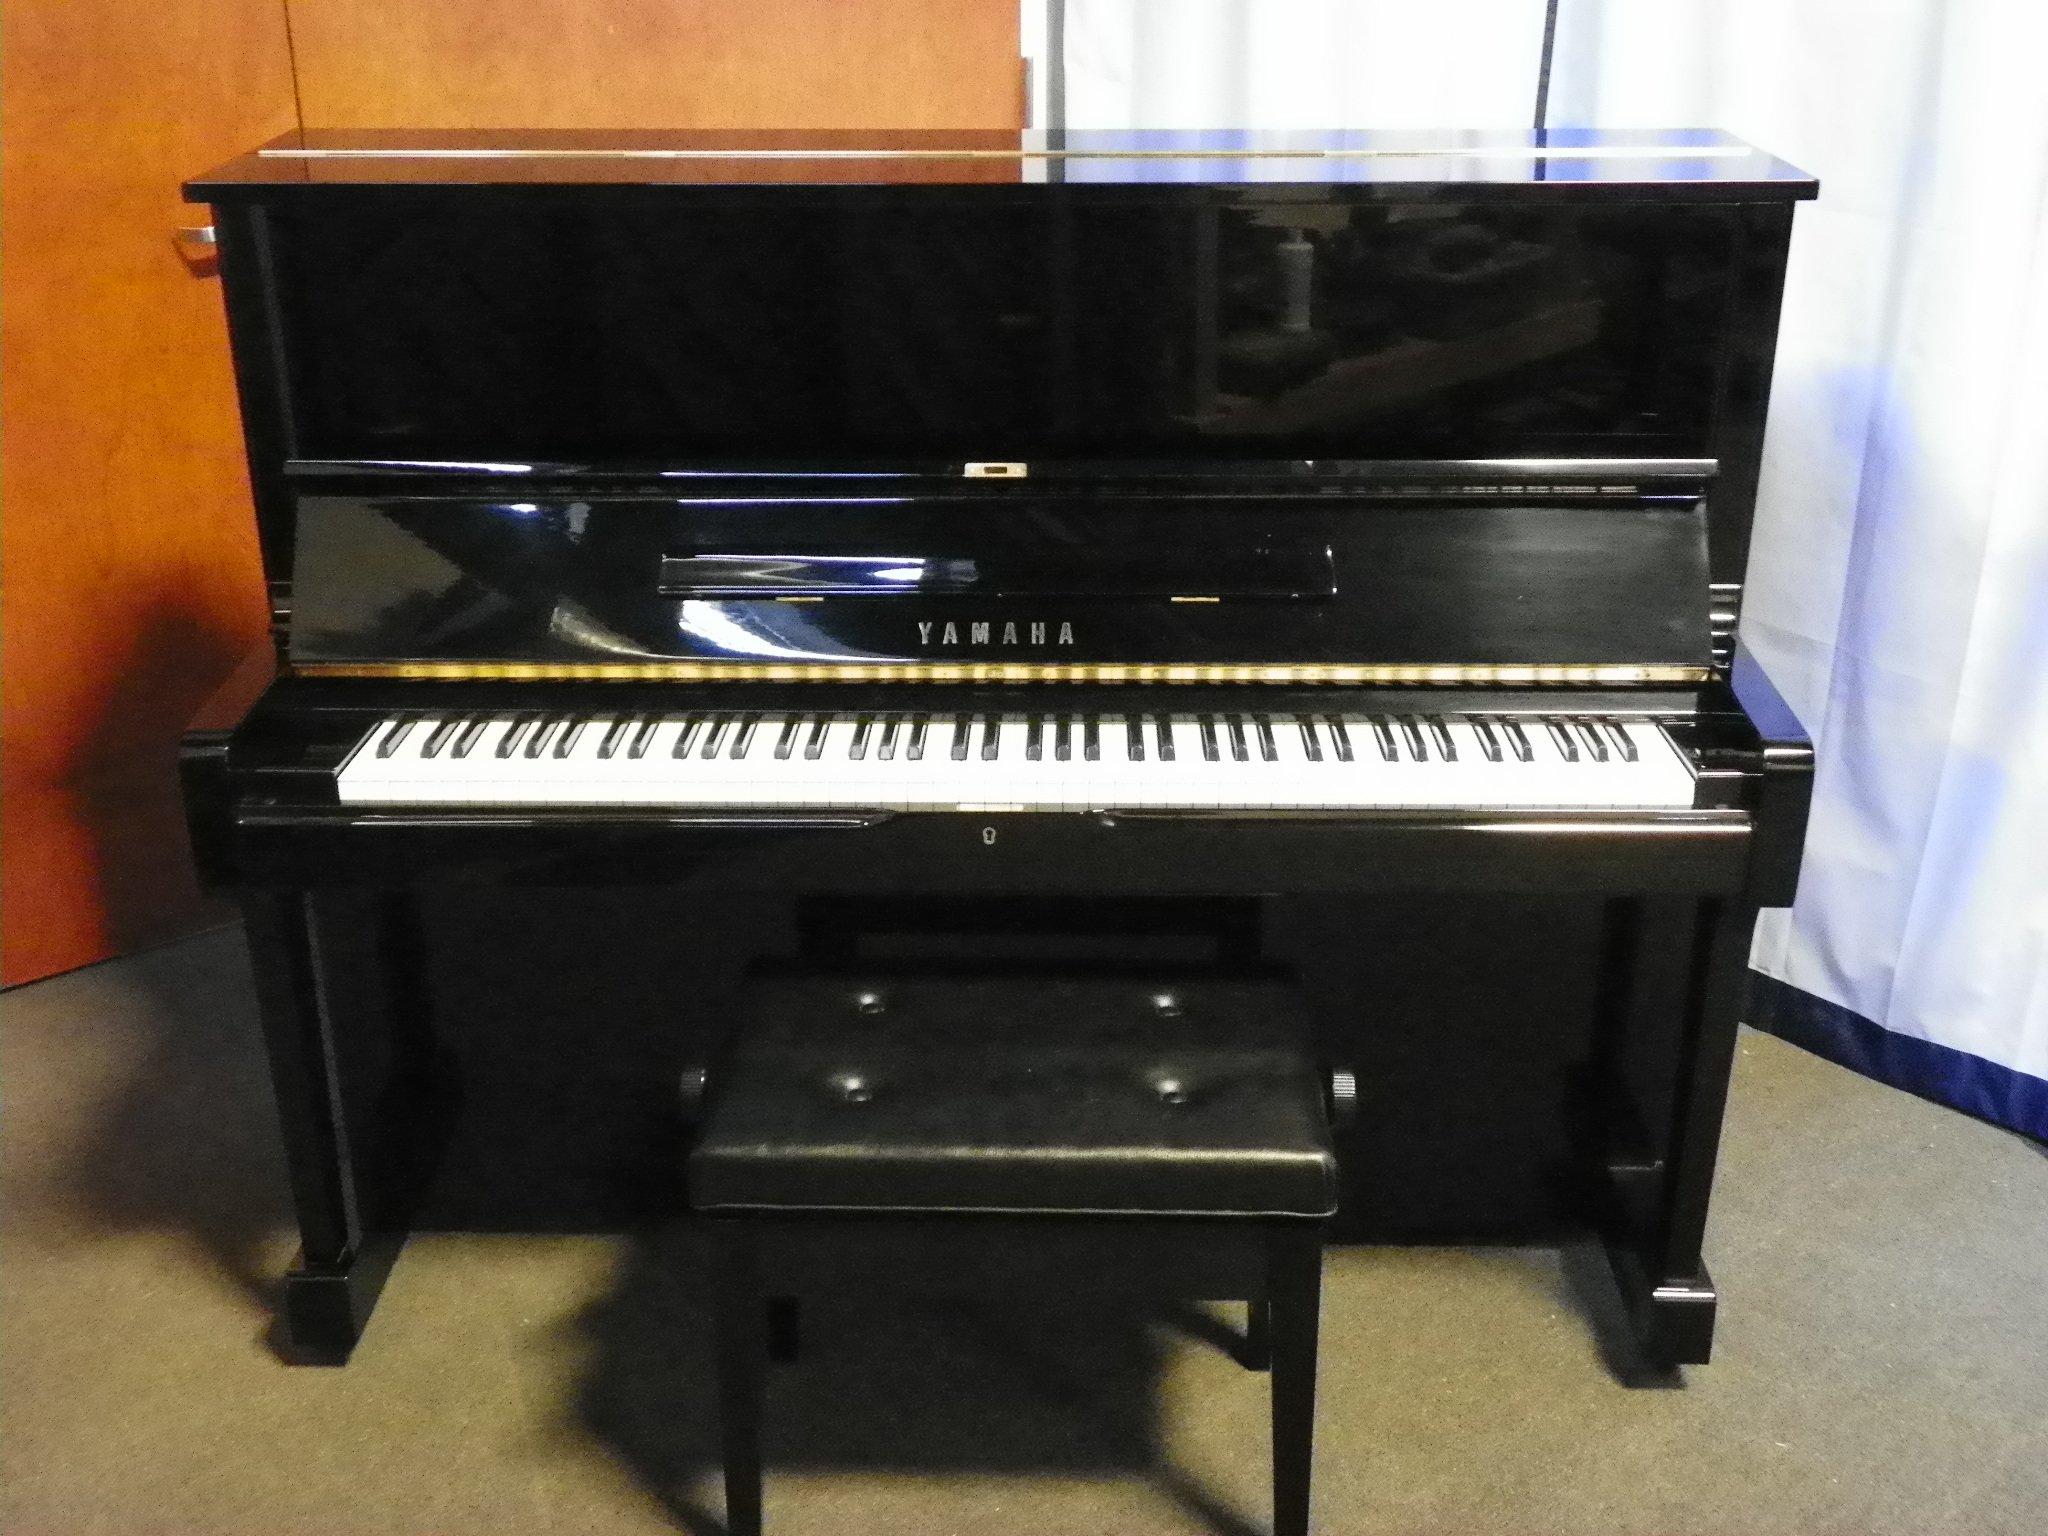 Yamaha piano england piano for Piano upright dimensions